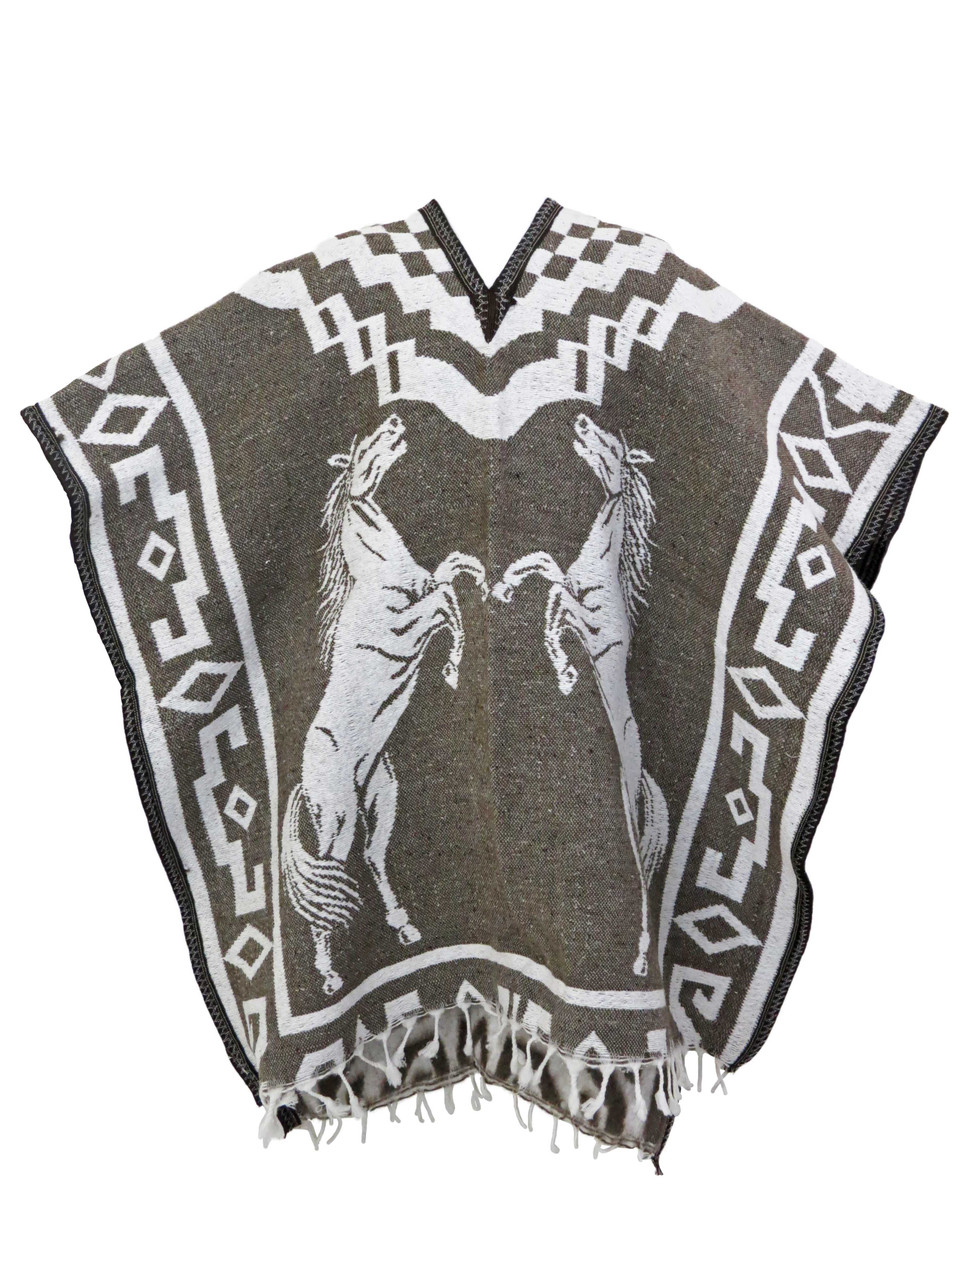 Mexican Poncho Serape Blanket GABAN Reversible Horses Relinchando Black-Gold